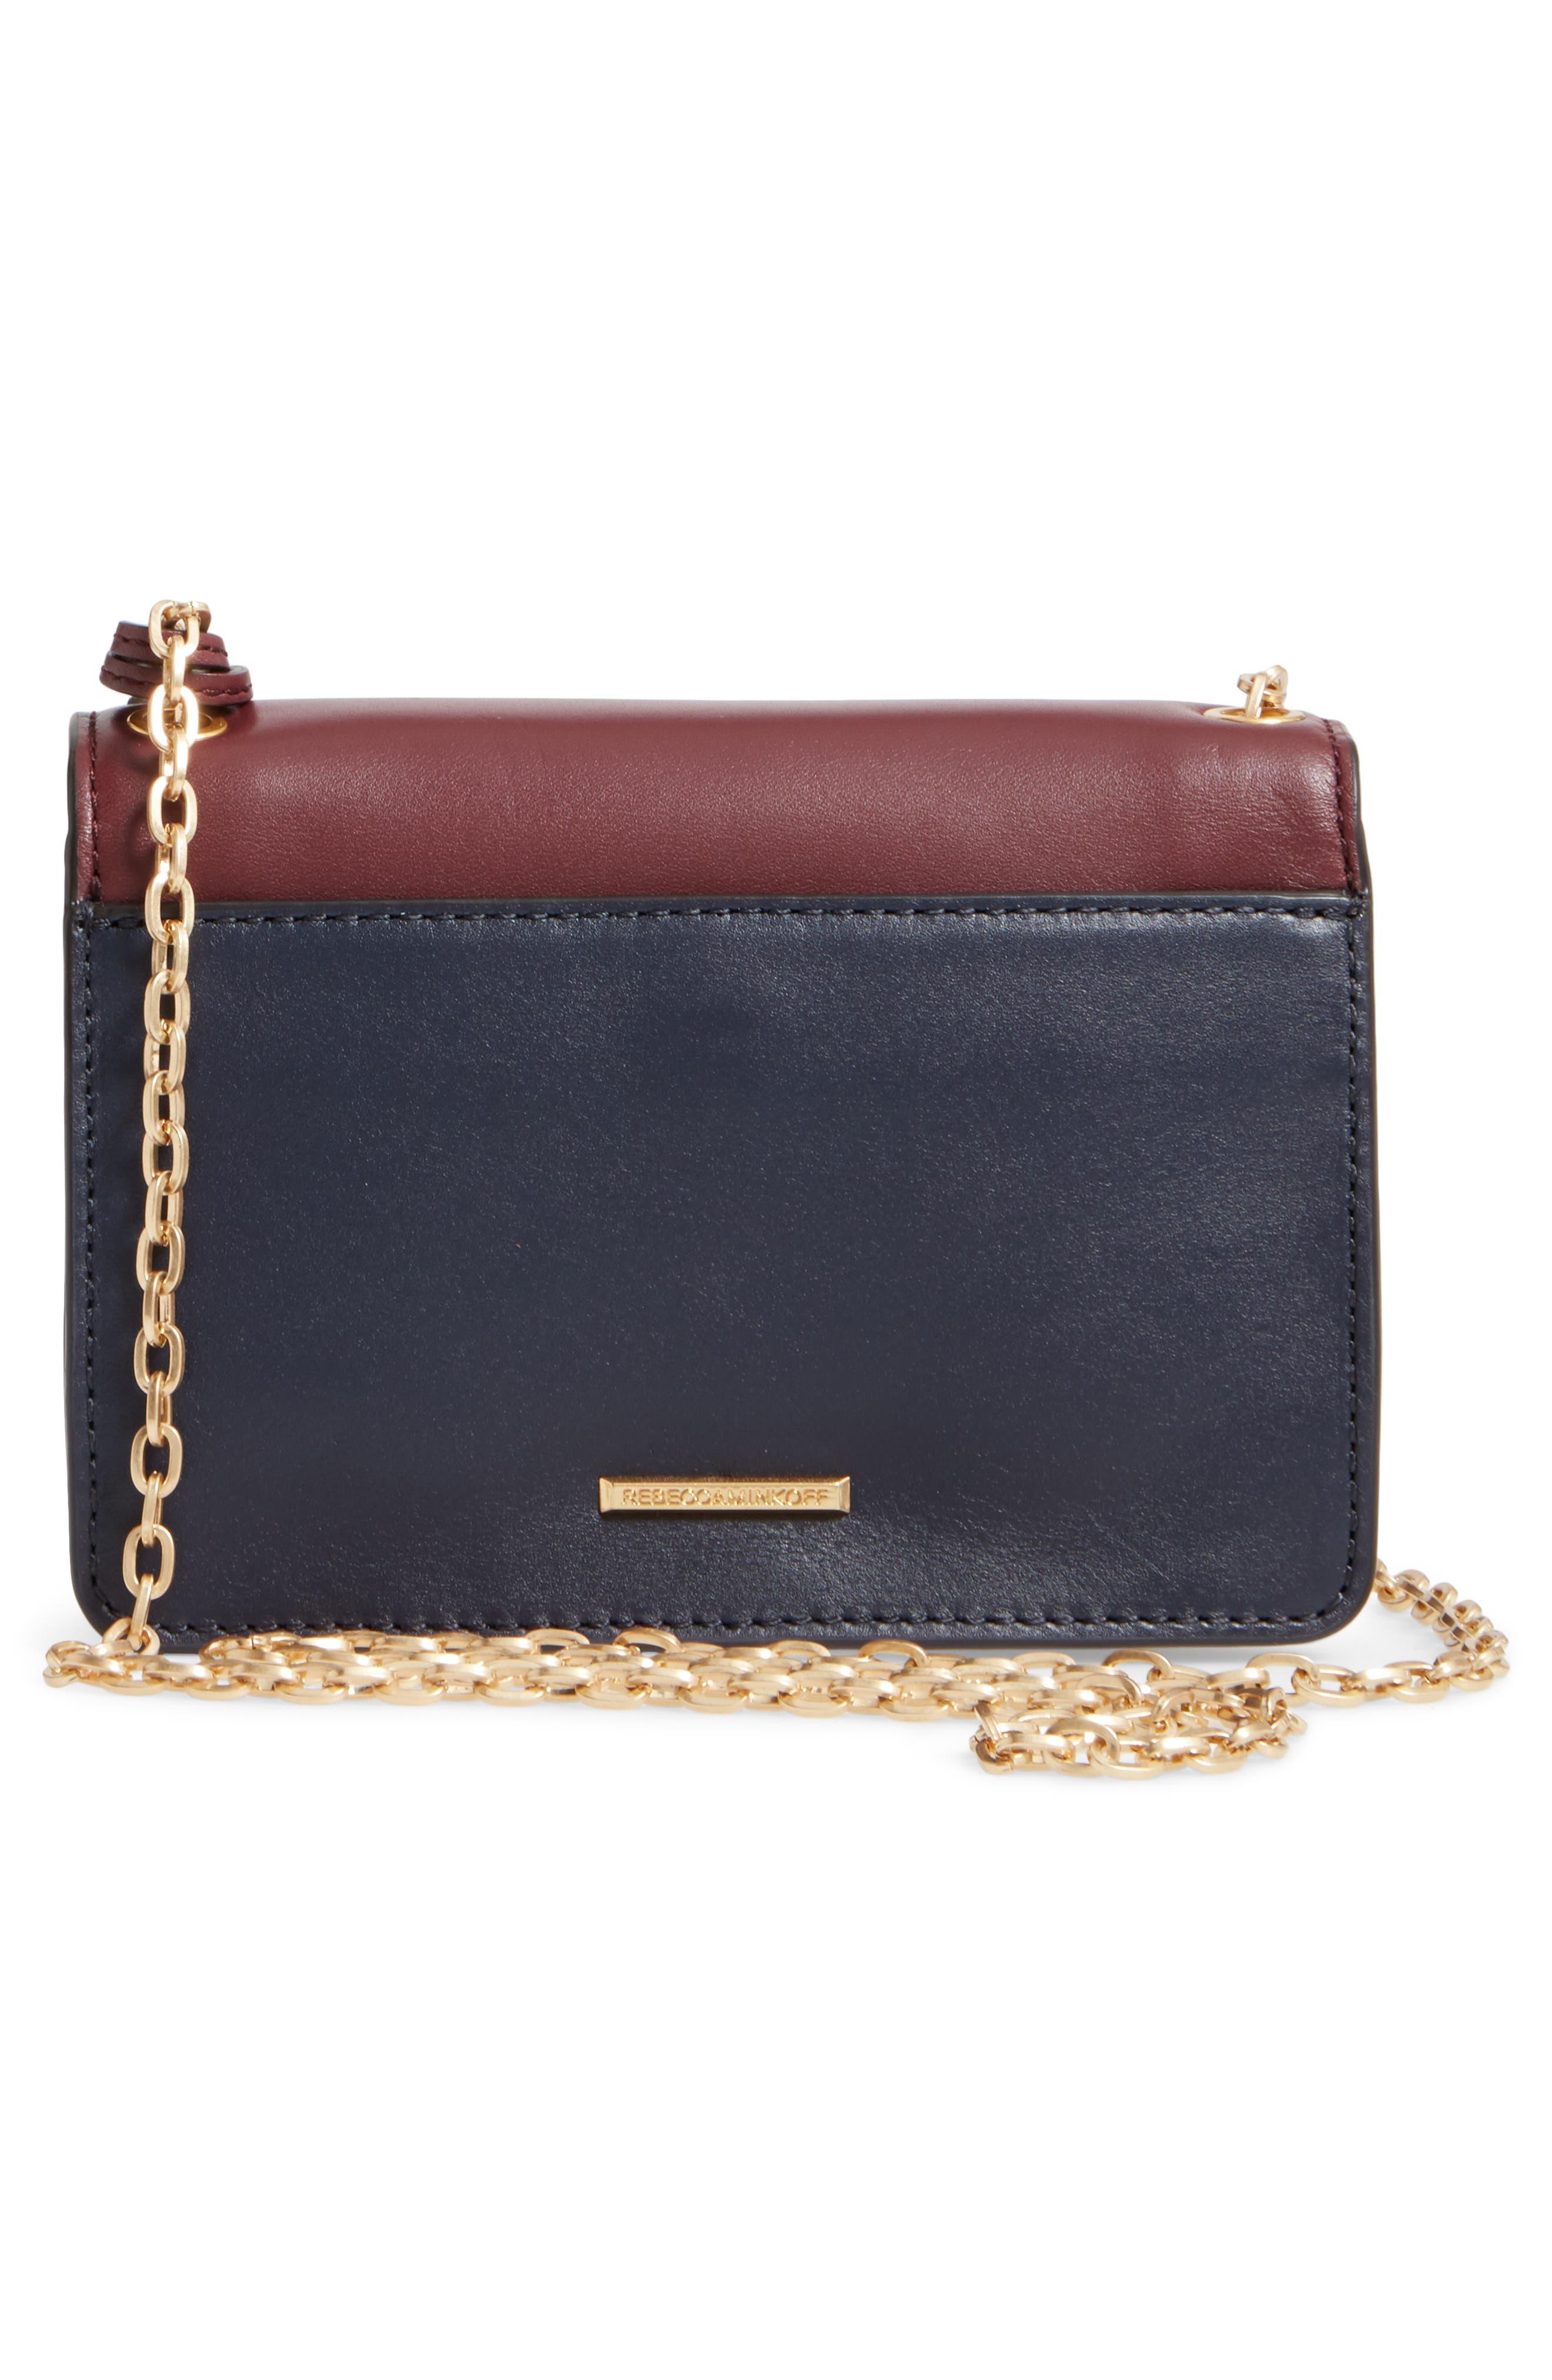 Mini Chain Leather Crossbody Bag,                             Alternate thumbnail 3, color,                             600